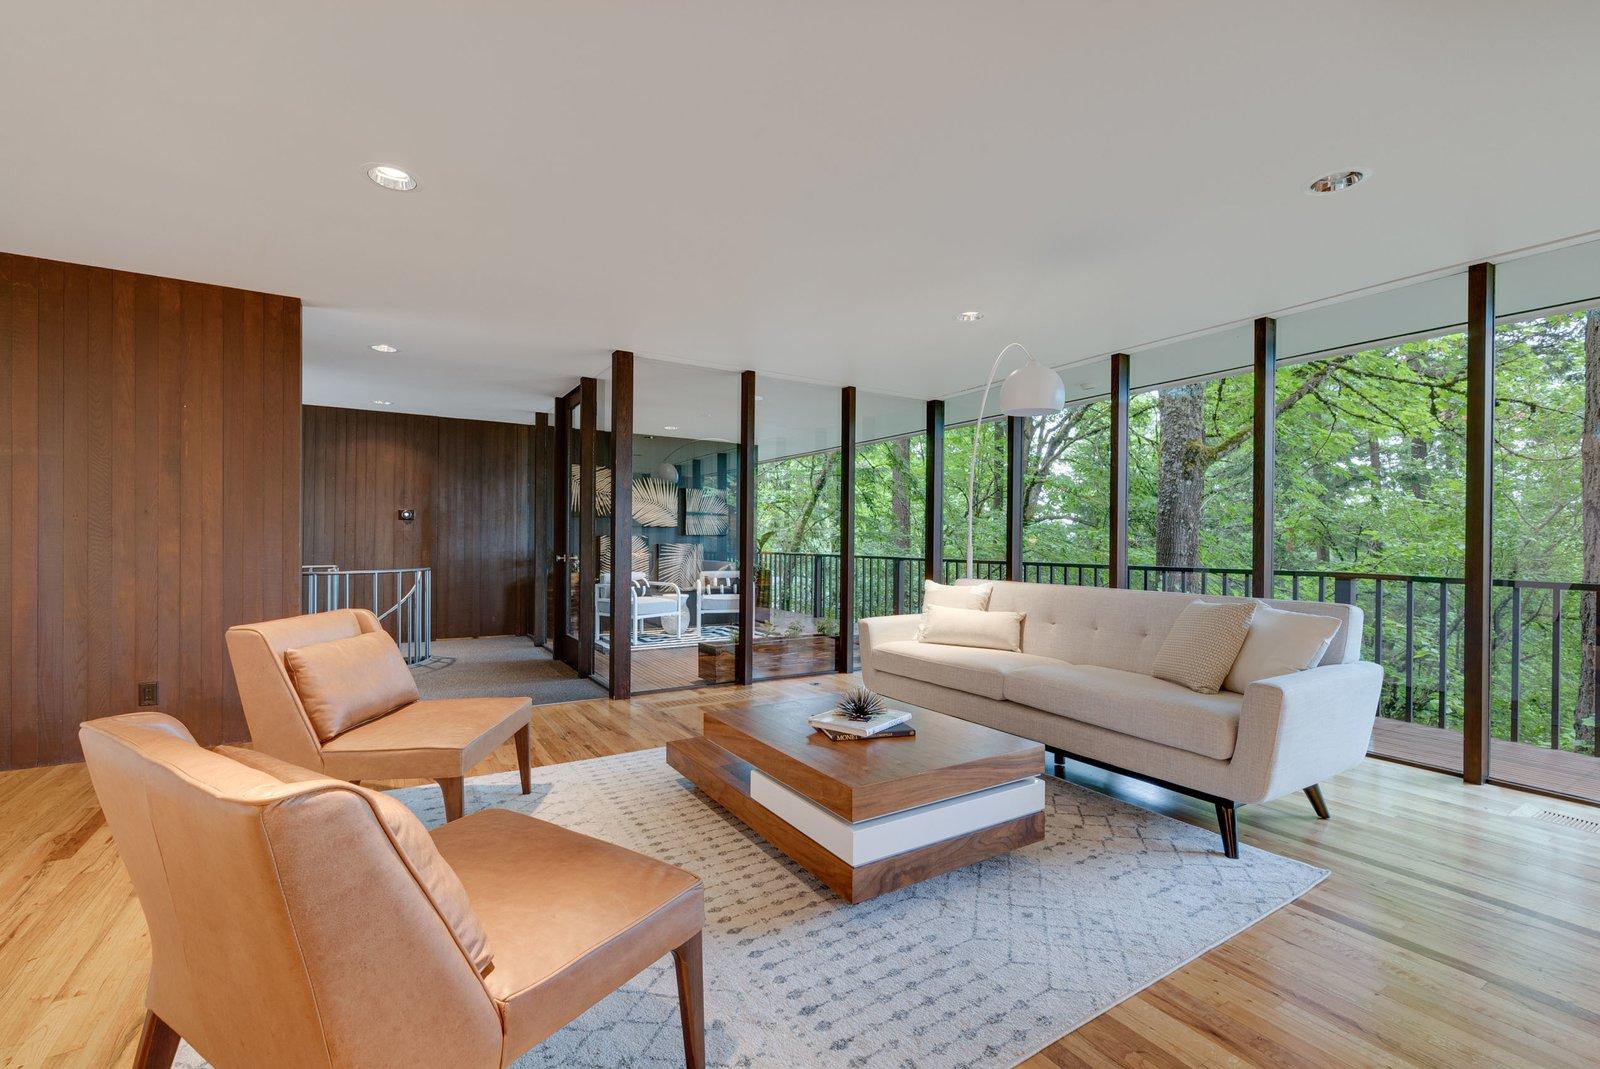 William Fletcher Portland Midcentury Home living room